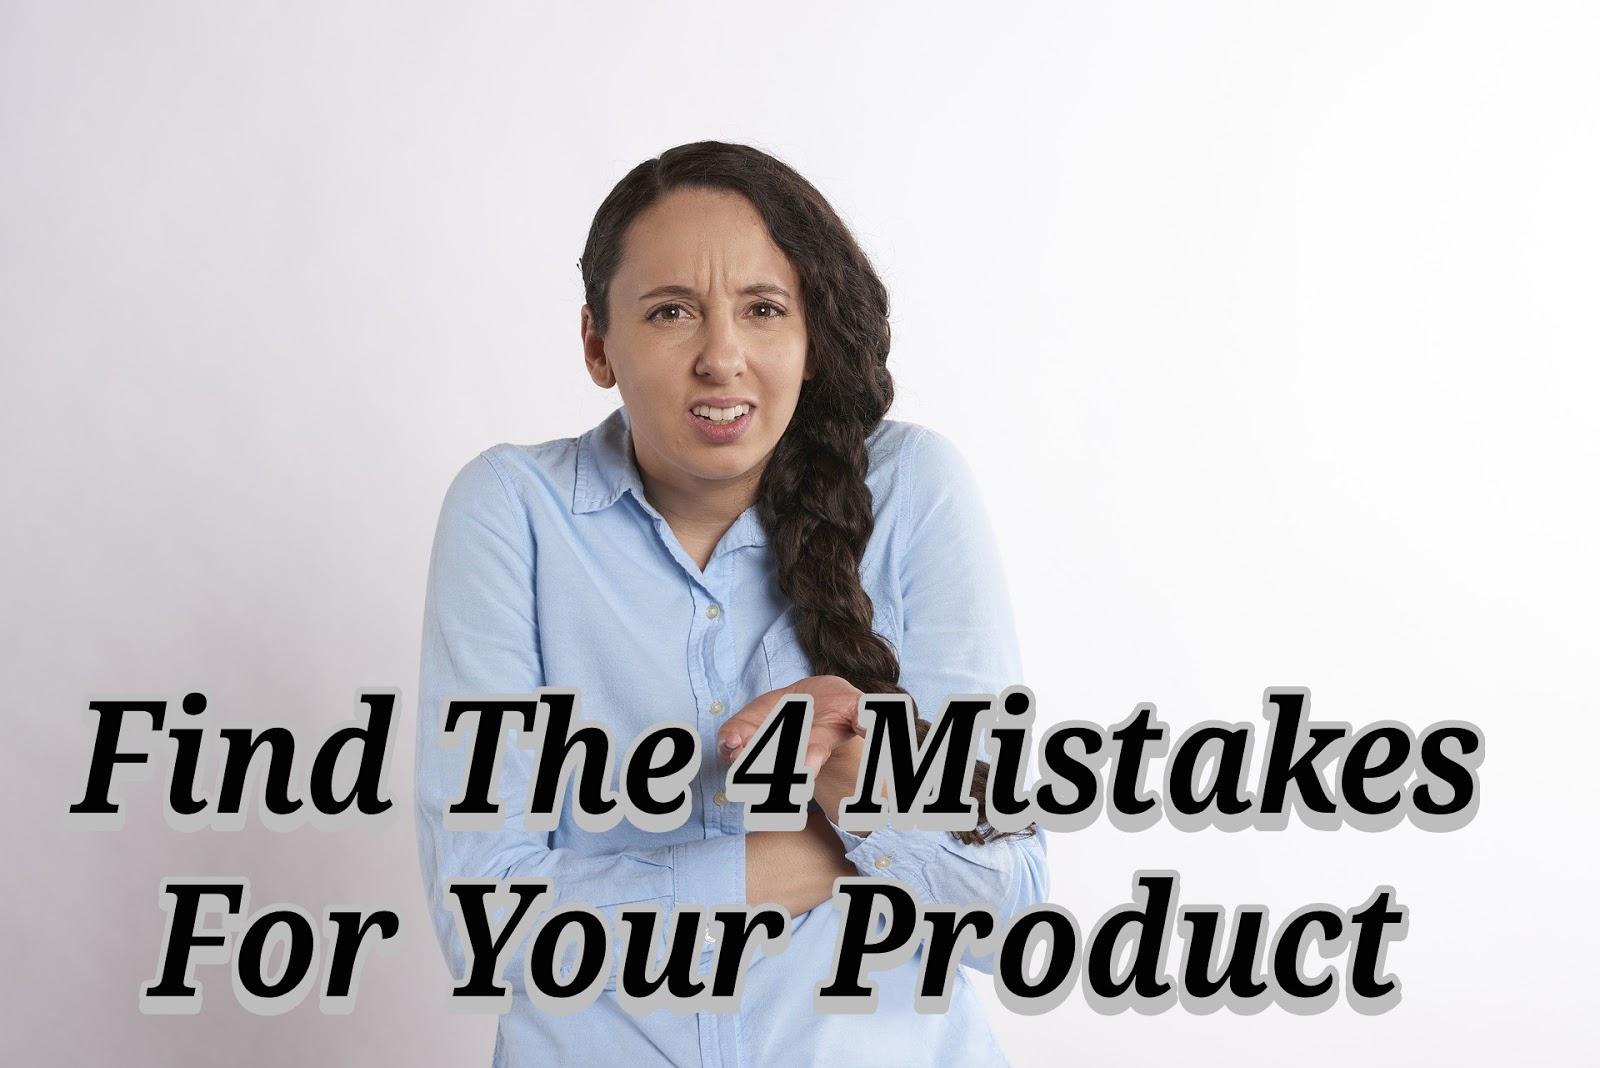 4 Kesalahan Dasar Dalam Memulai Memasarkan Produk Sendiri